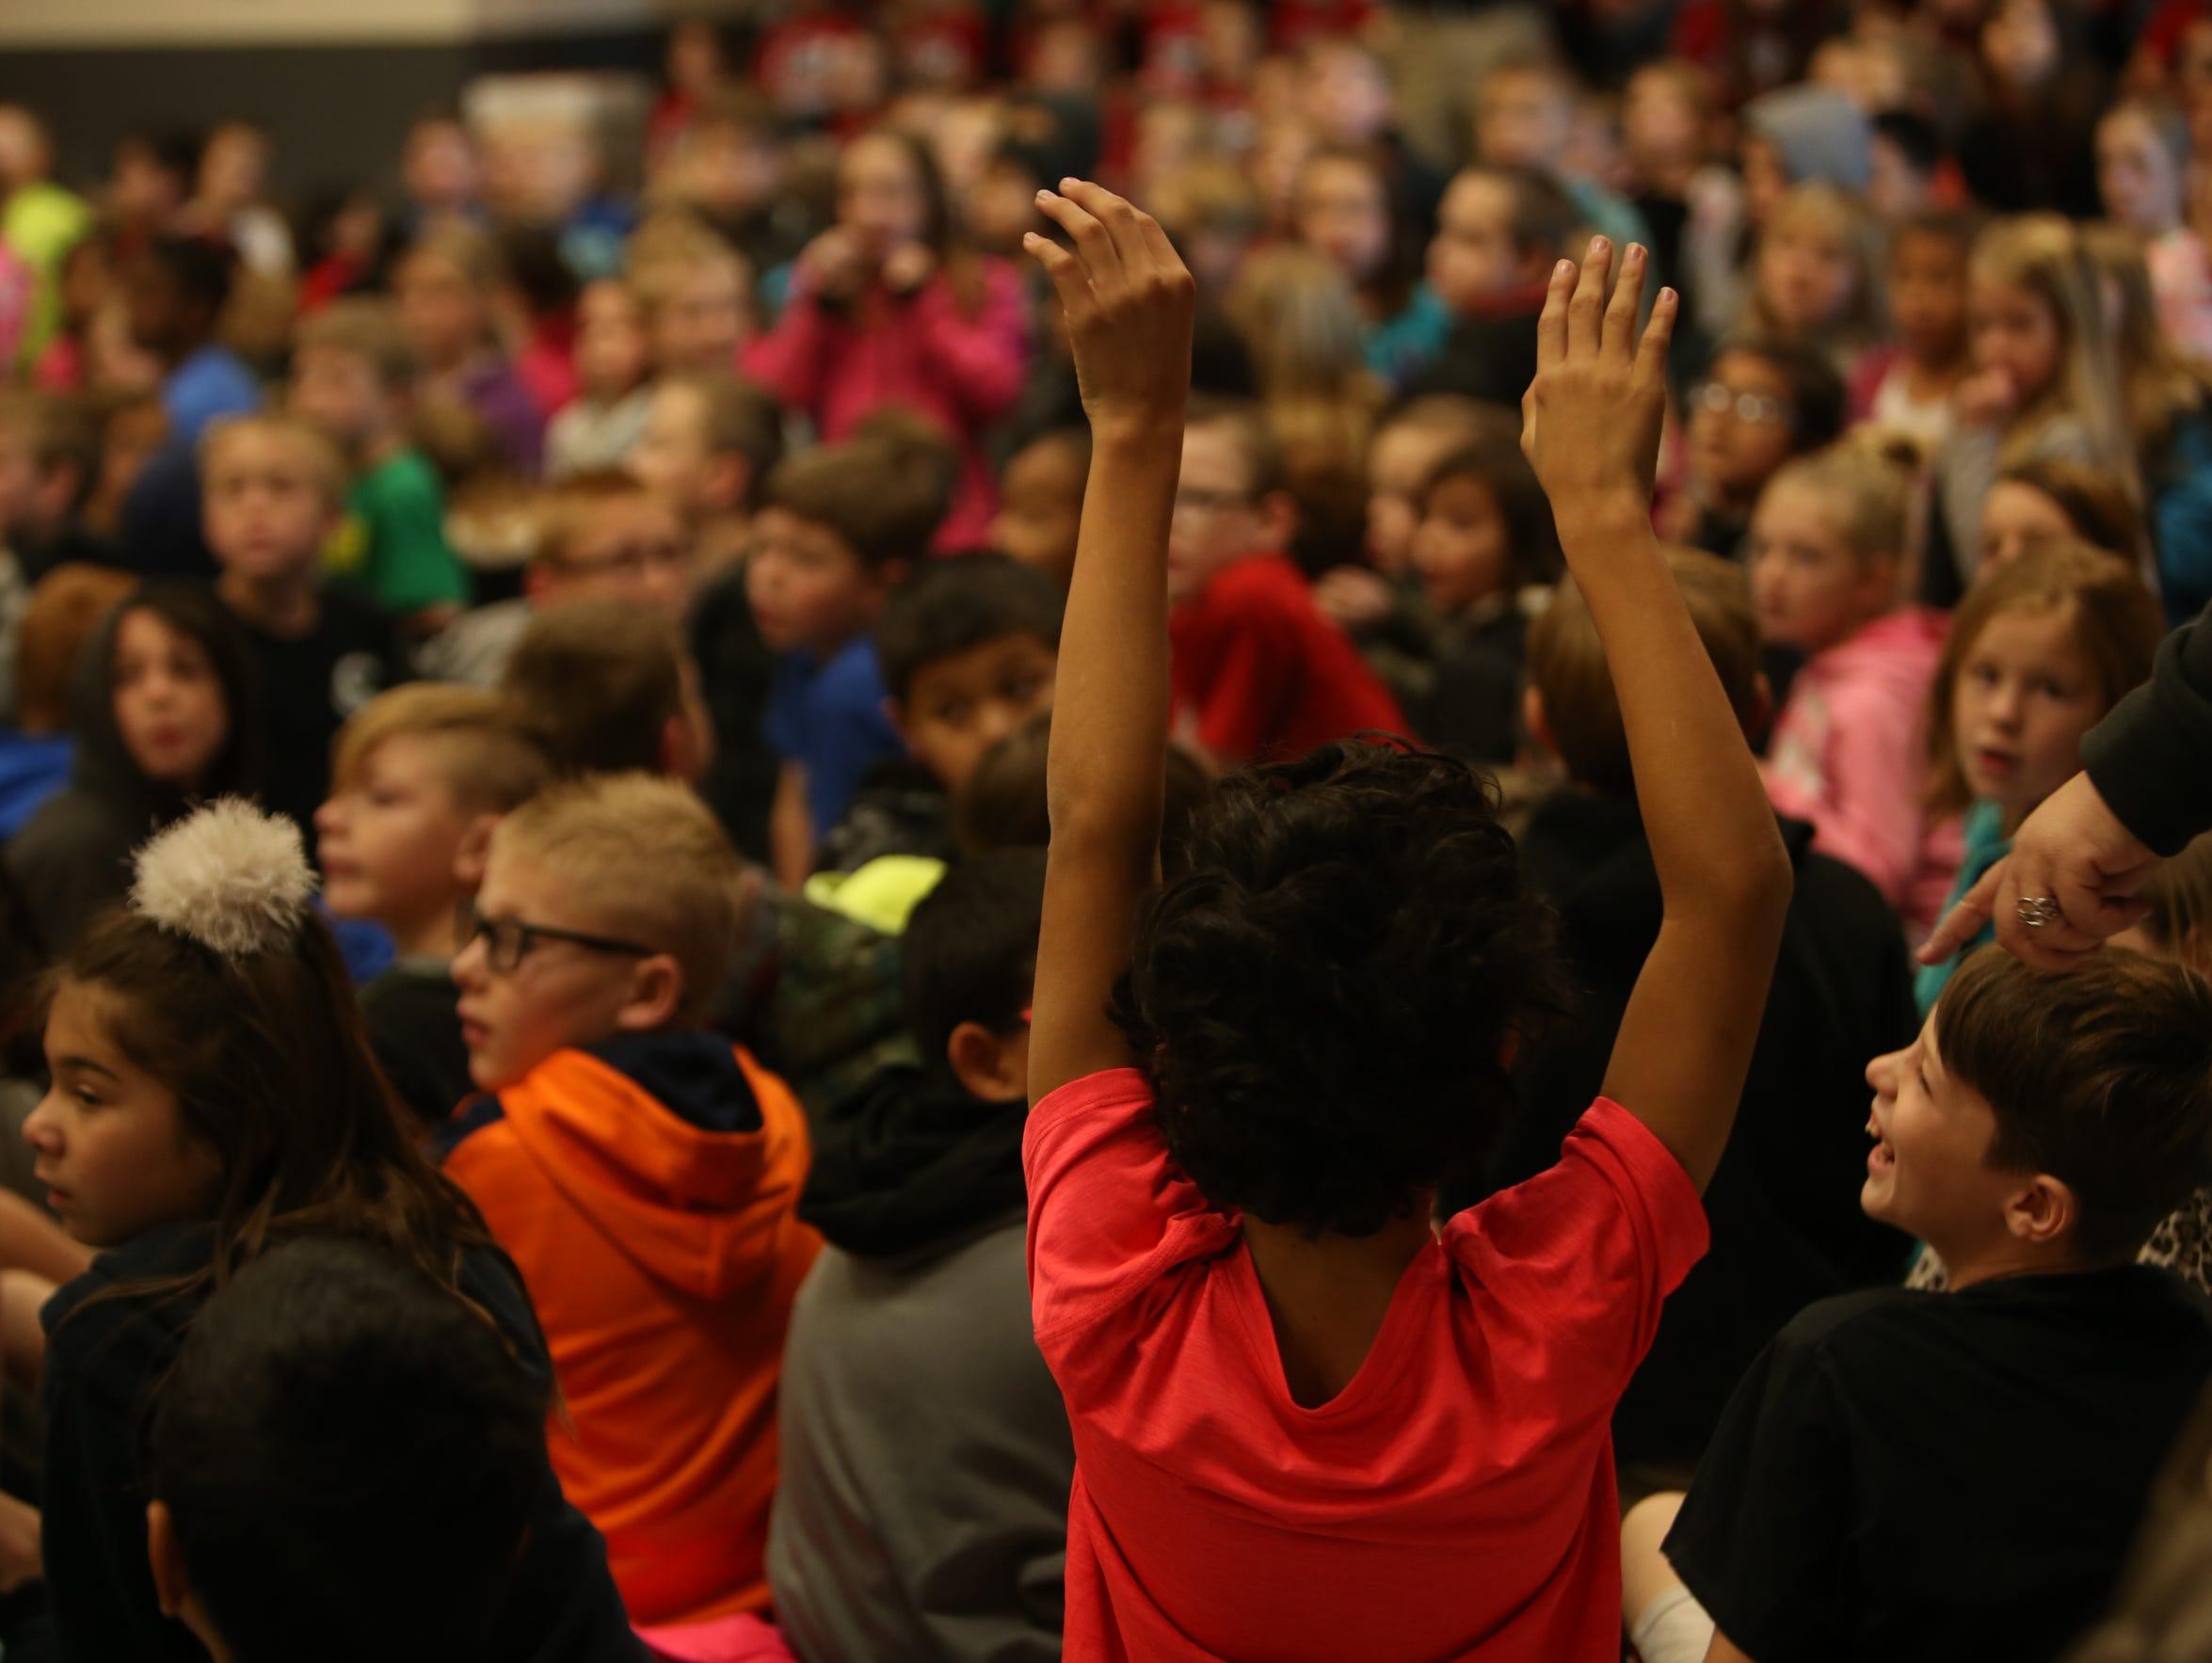 A child in Washington County School District raises